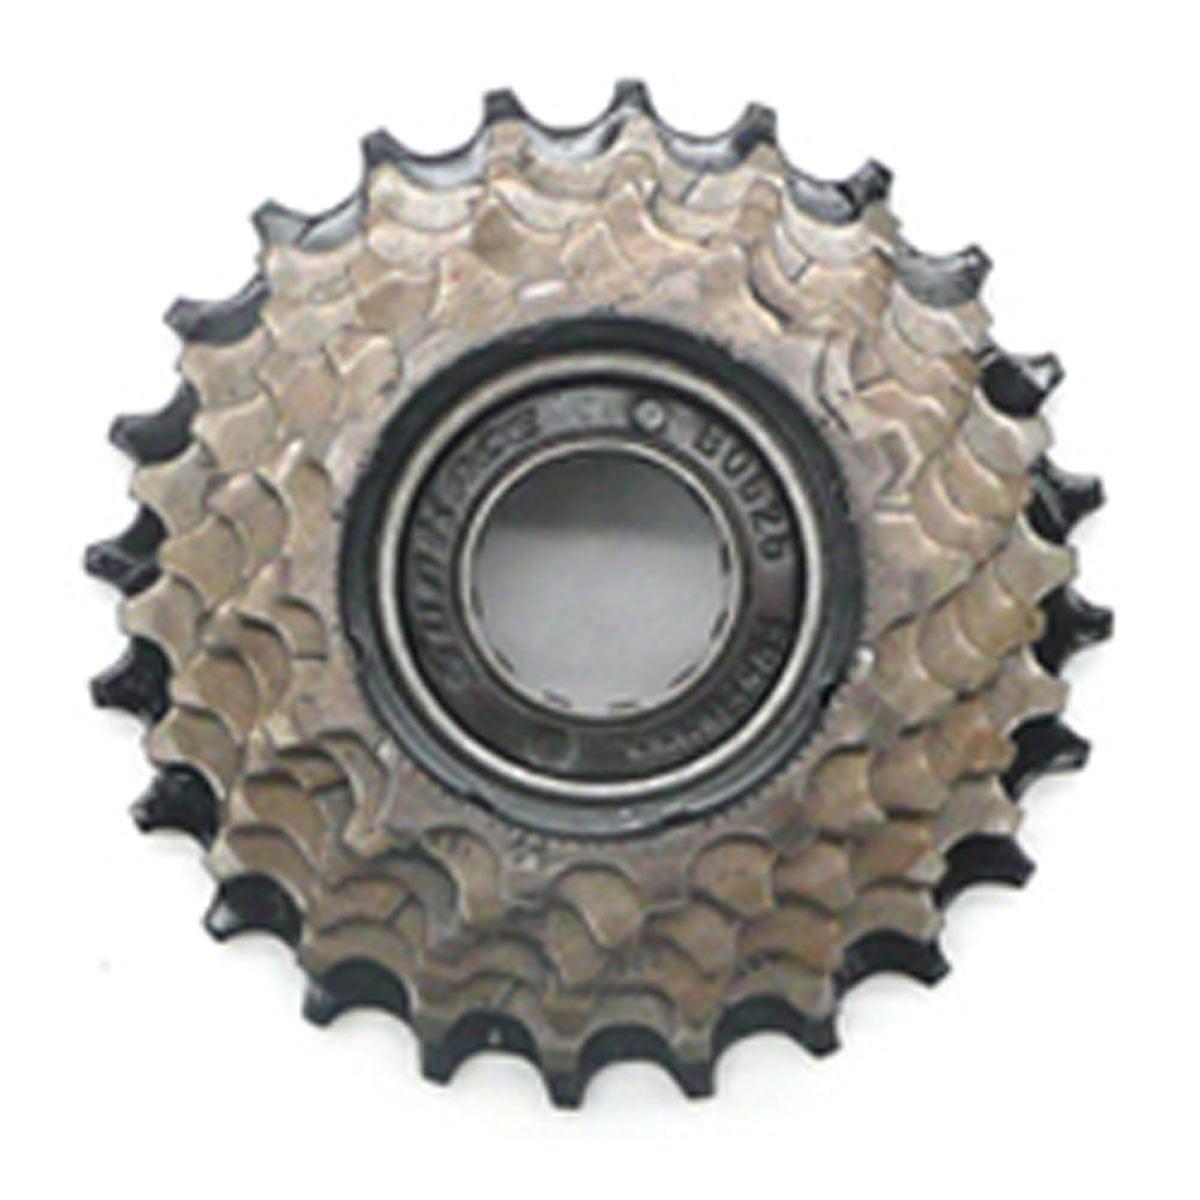 SunRace 6 Spd Freewheel 14-28T HG - 327-185